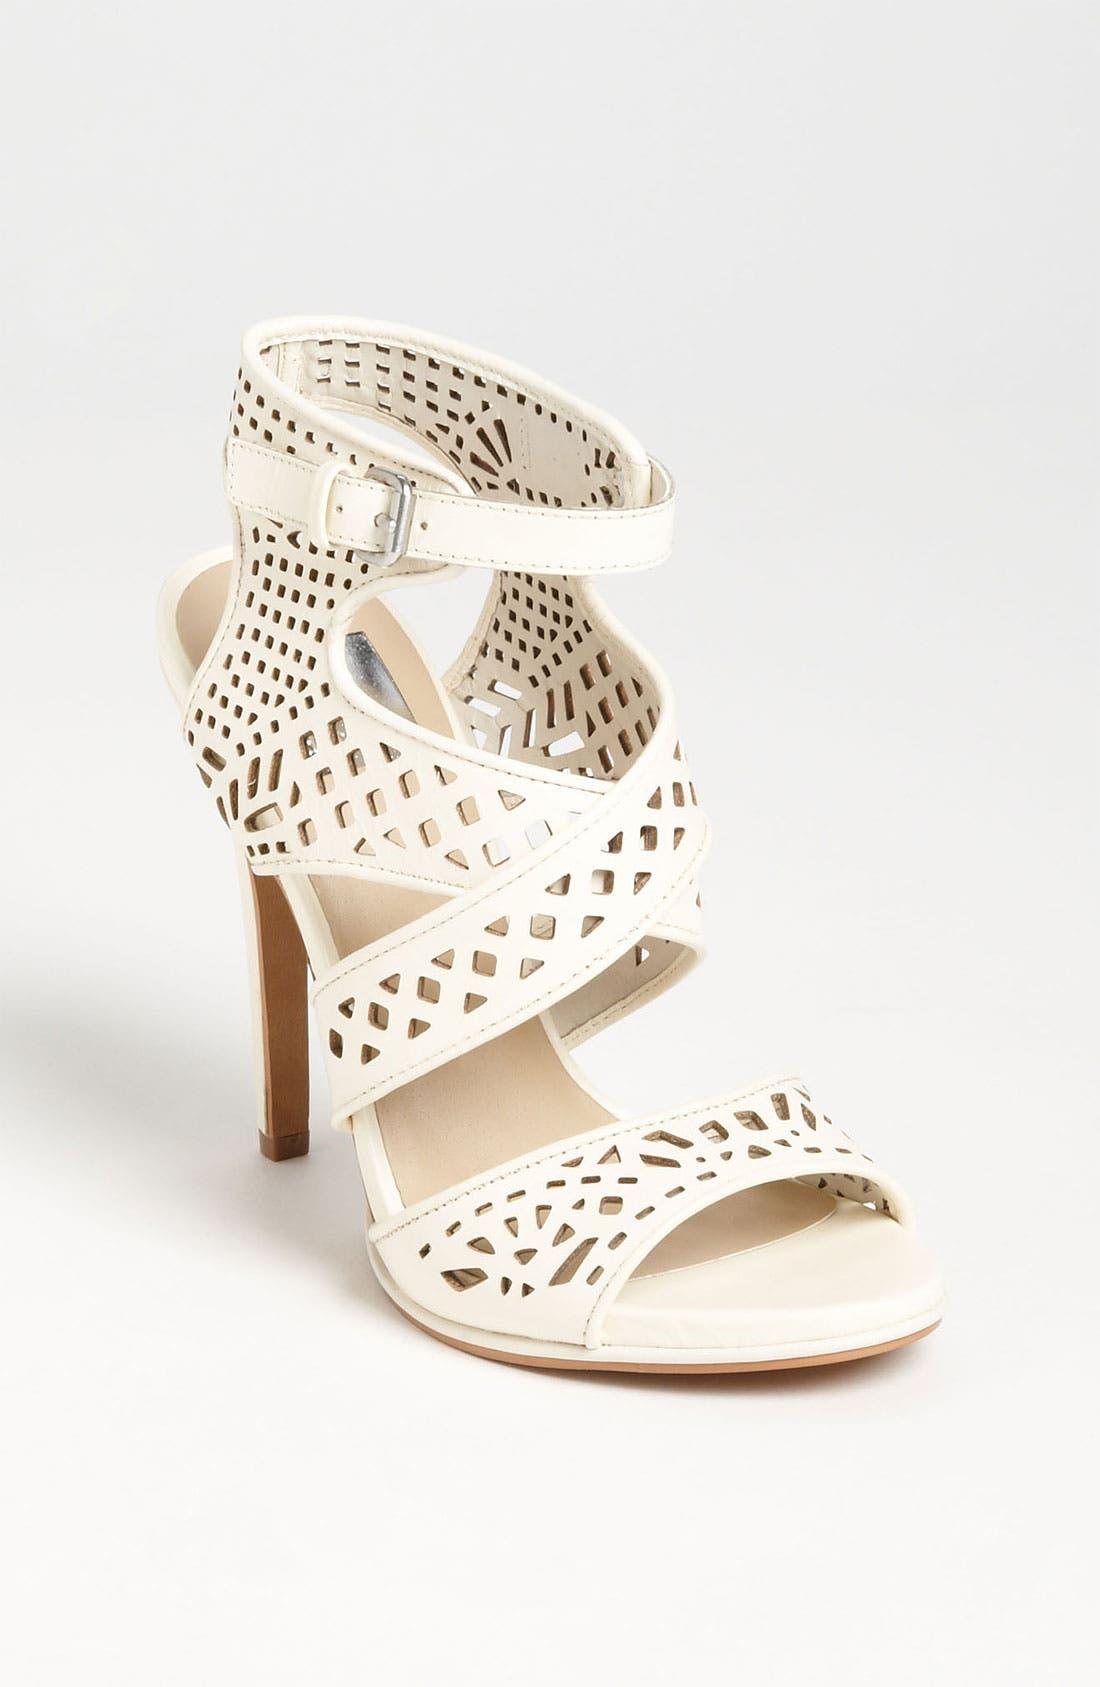 Alternate Image 1 Selected - Dolce Vita 'Ziti' Sandal